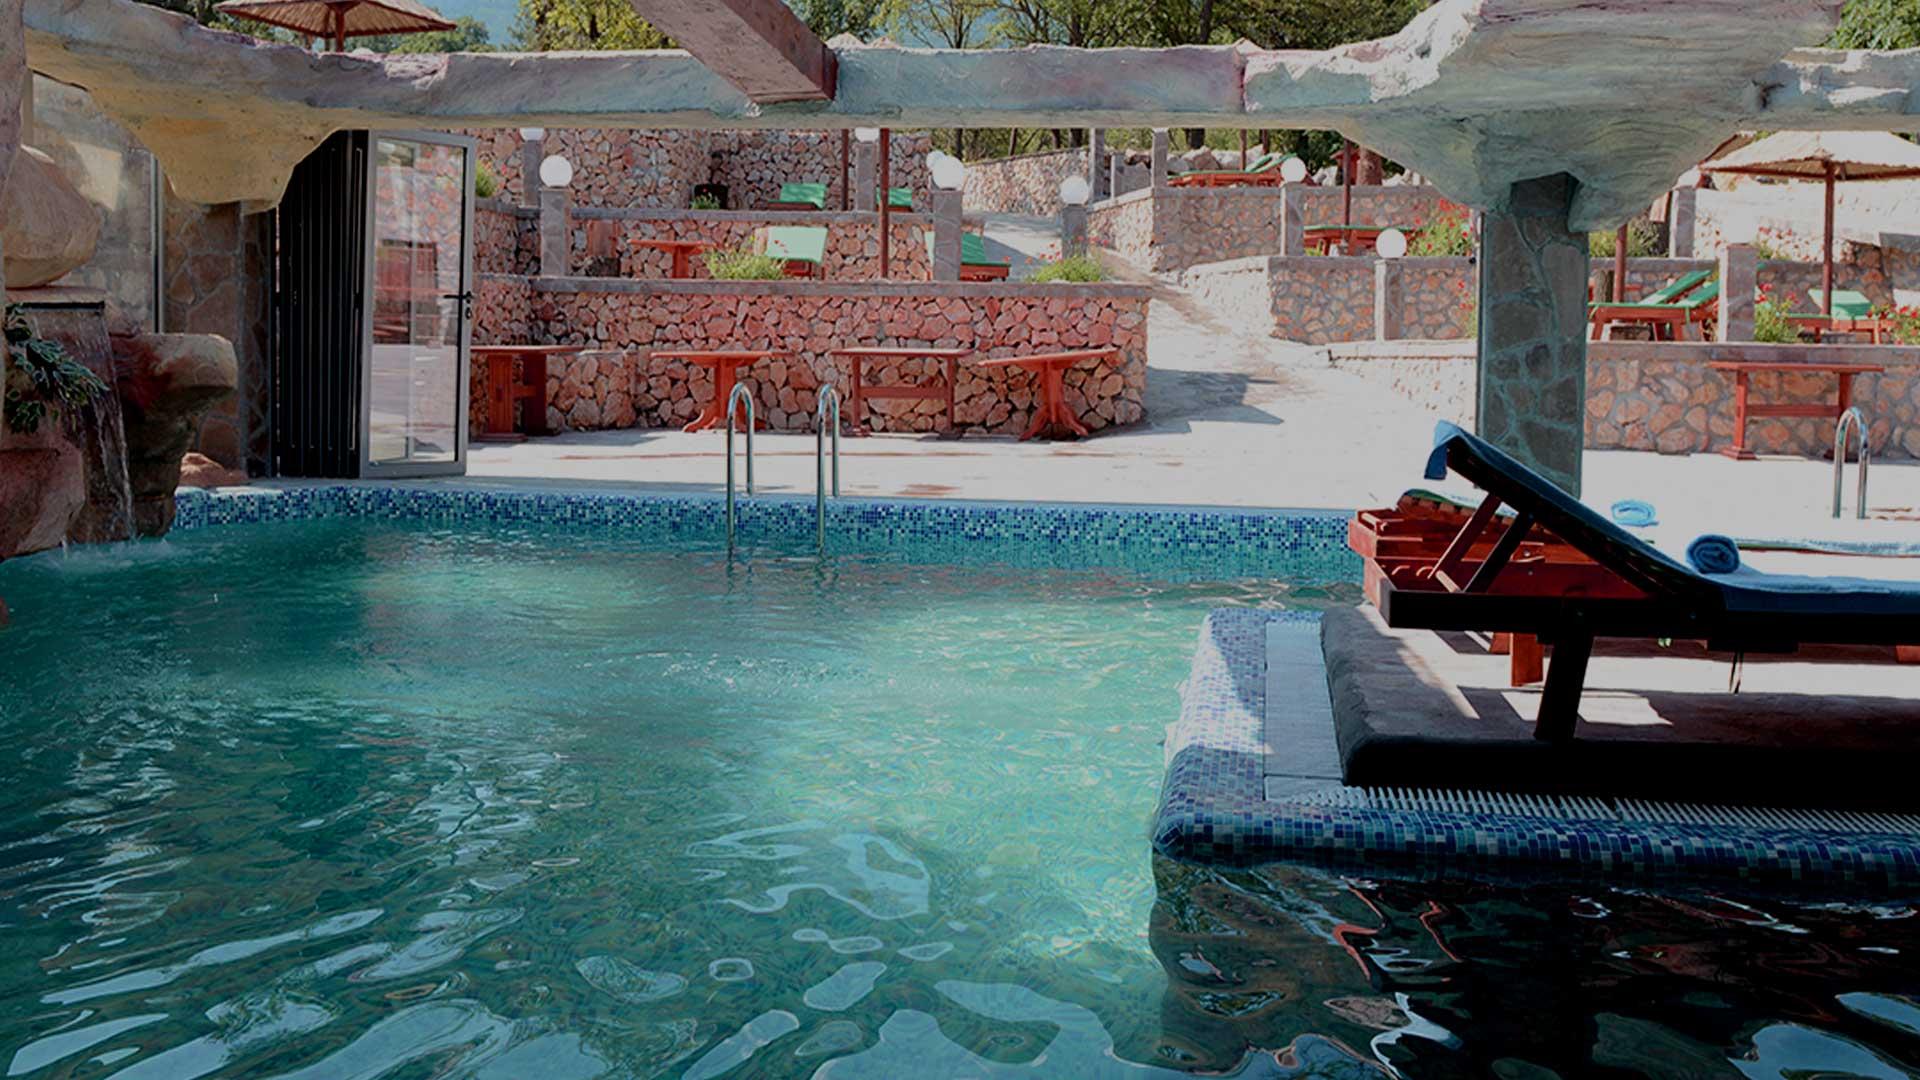 Egzotican bazen za sve vremenske prilike